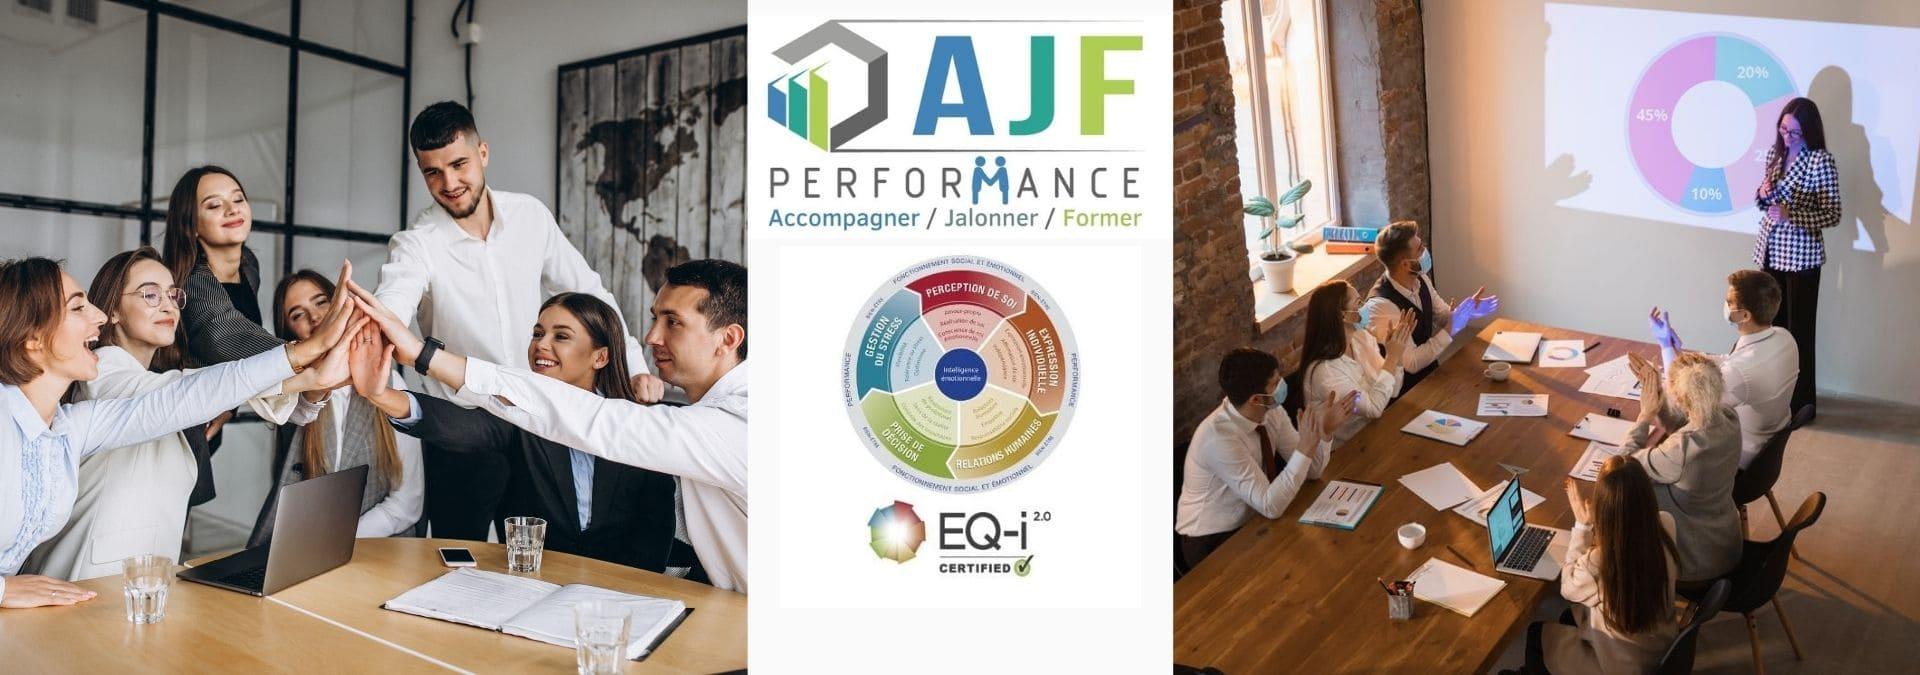 Certification EQ-i 2.0 EQ 360 - AJF Performance img